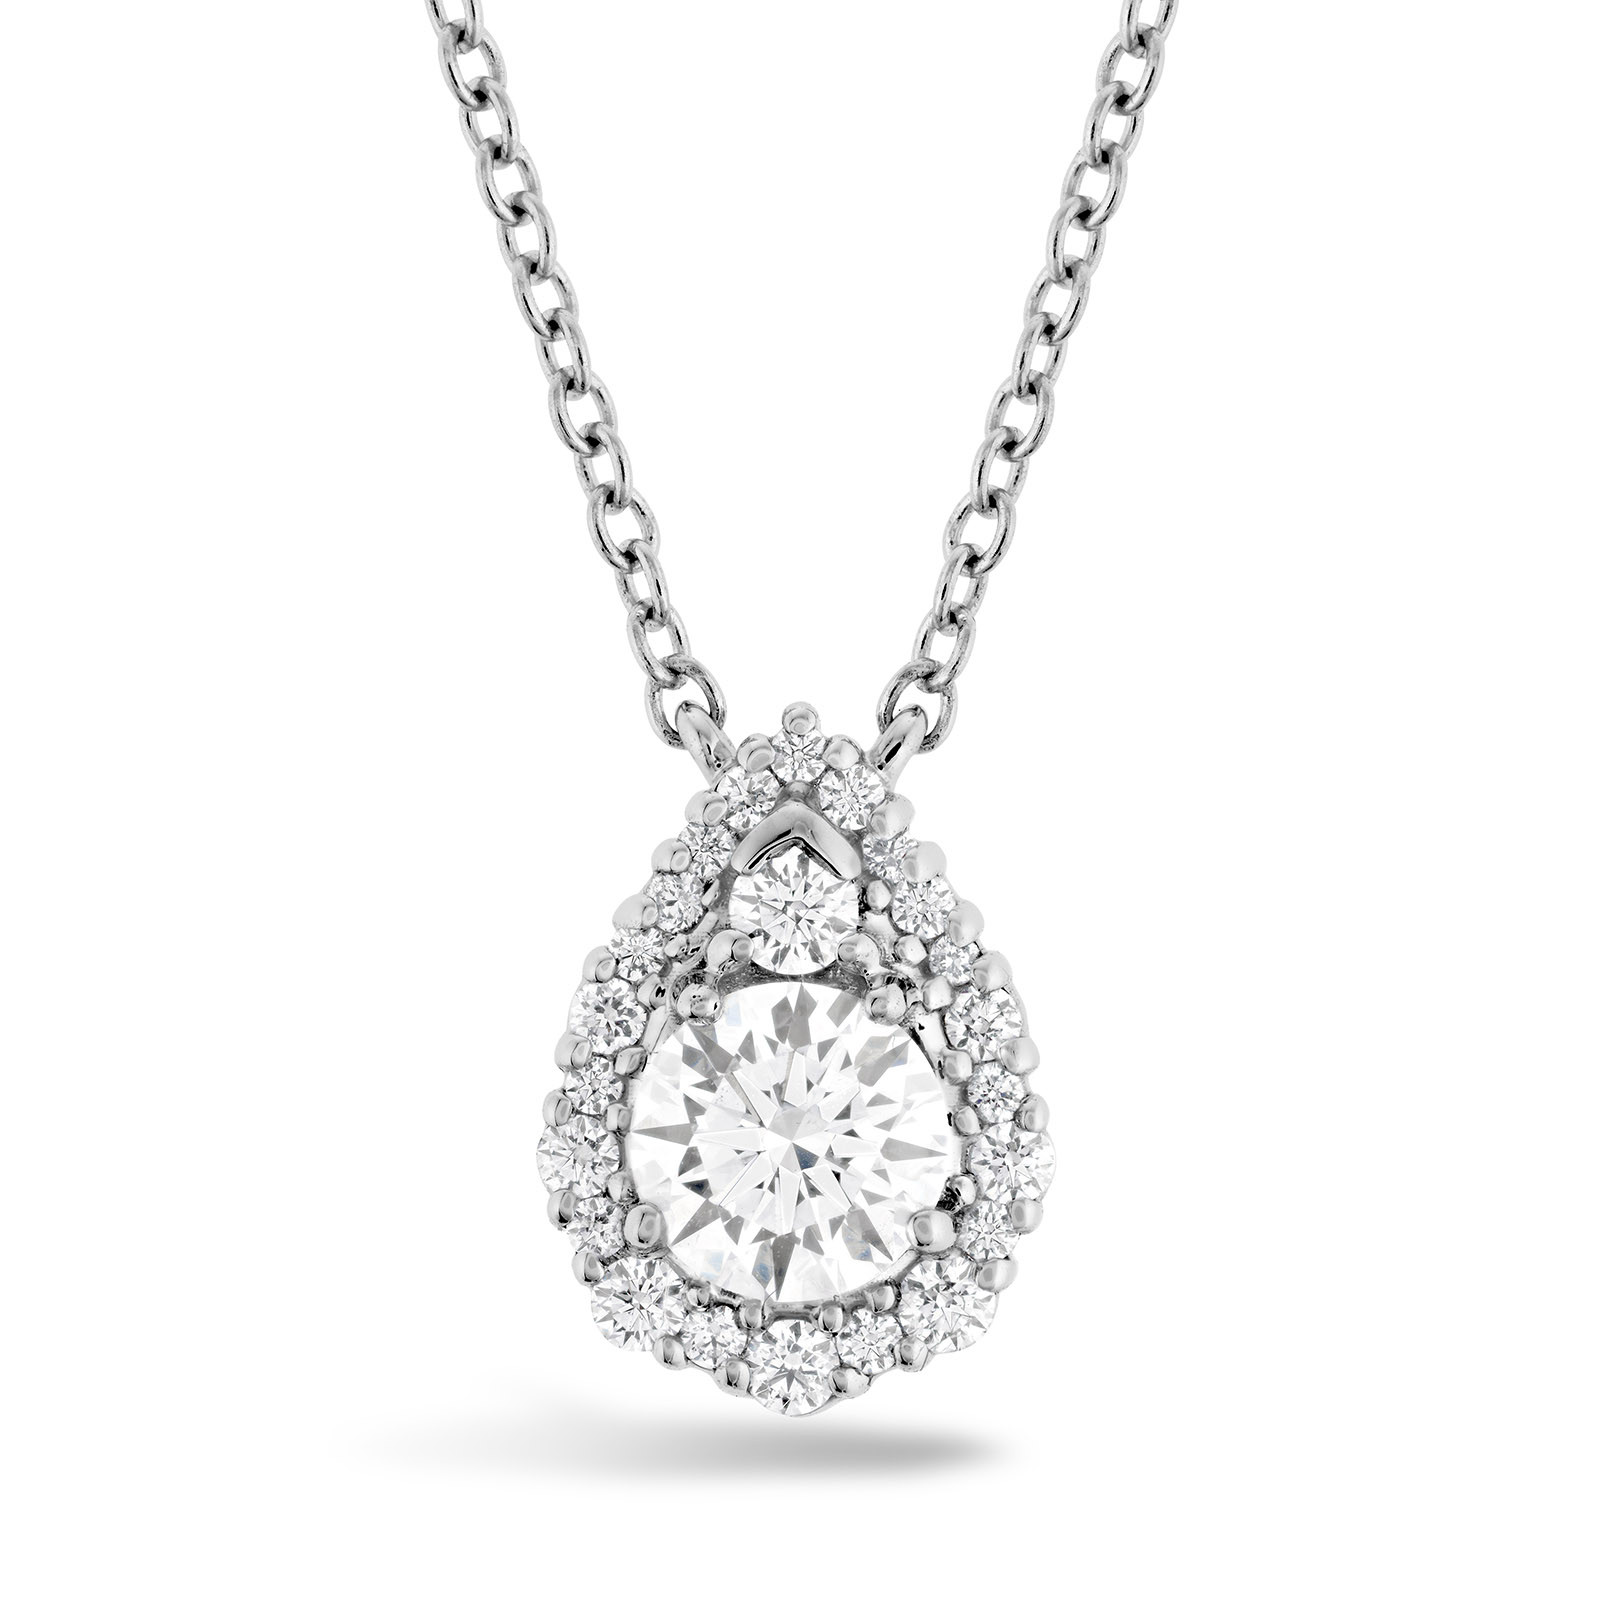 New Hearts On Fire® 1.05 CTW Diamond Teardrop Necklace